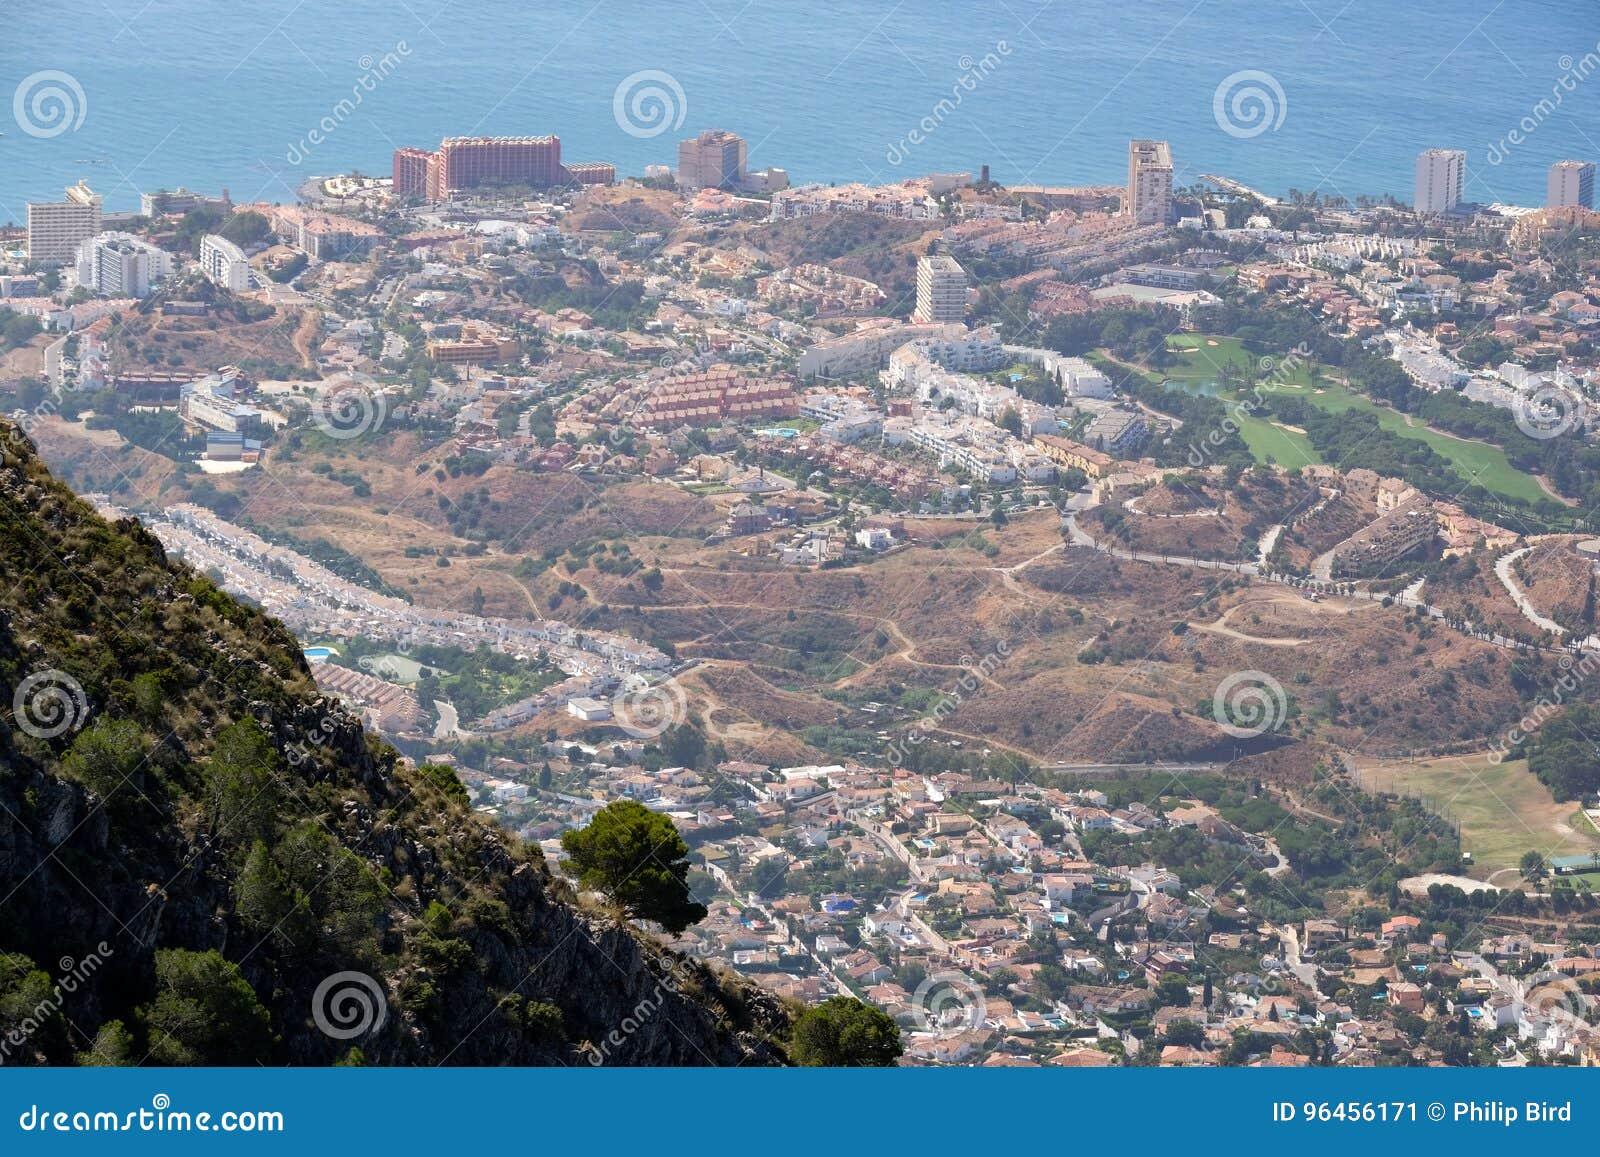 BENALMADENA, ANDALUCIA/SPAIN - LIPIEC 7: Widok od góry Calamorr